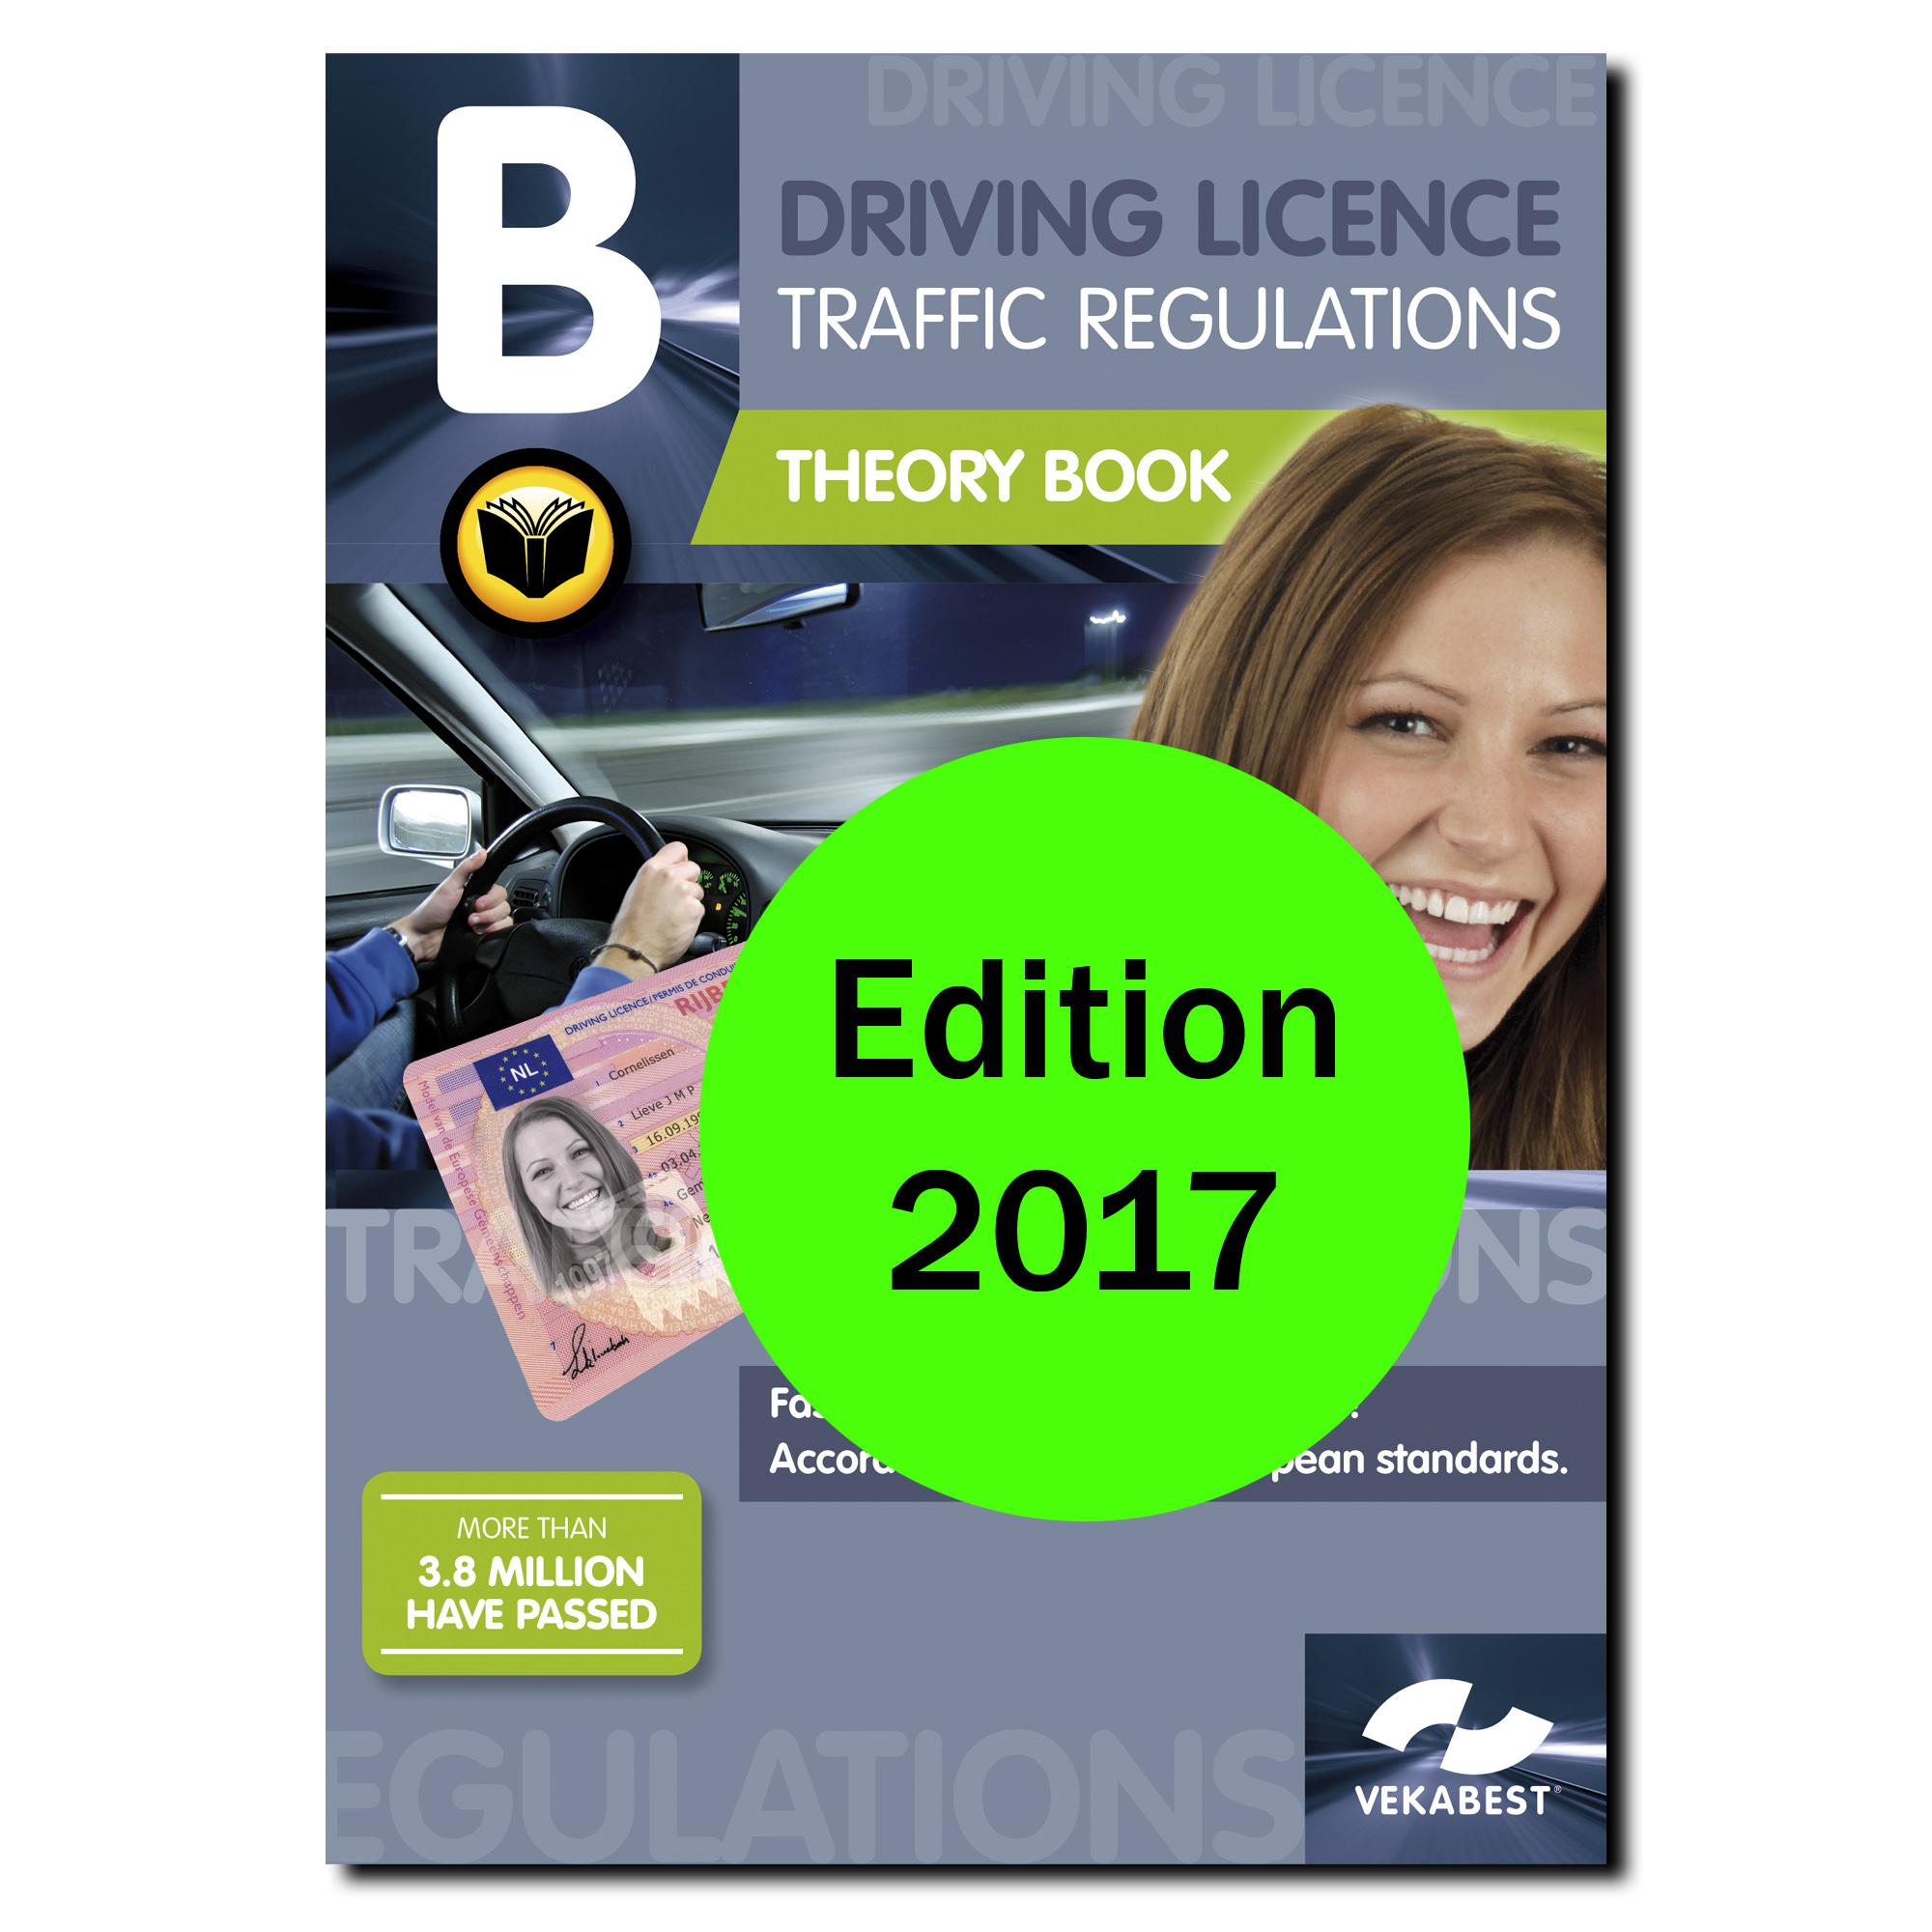 louisiana state drivers license book